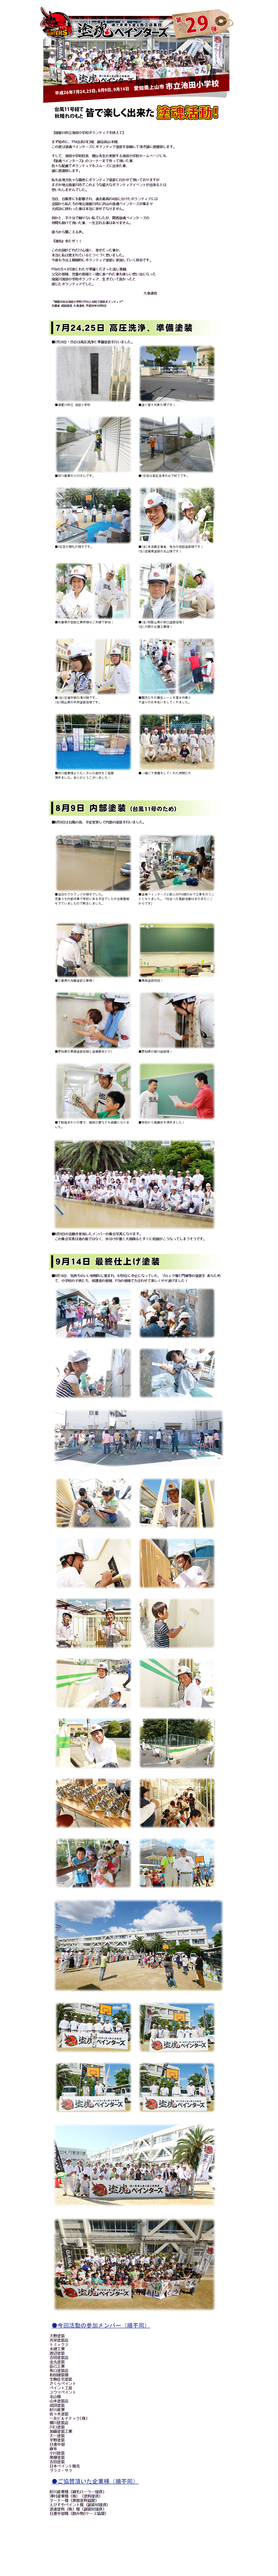 FireShot Capture 3 - 【愛知県上山市】池田小学校 I 塗魂ペインターズ_ - http___to-kon-painters.com_wp_activ